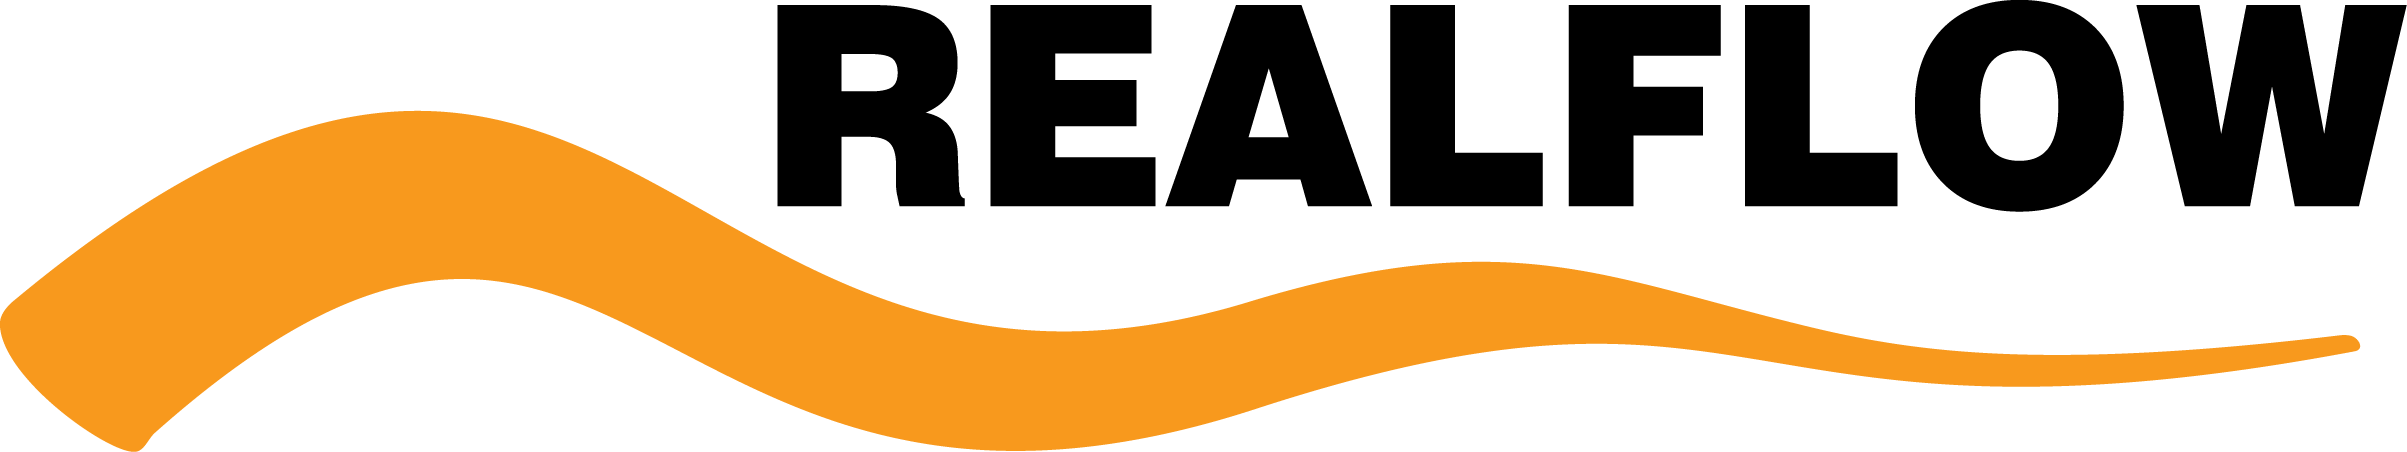 realflow_logo_black